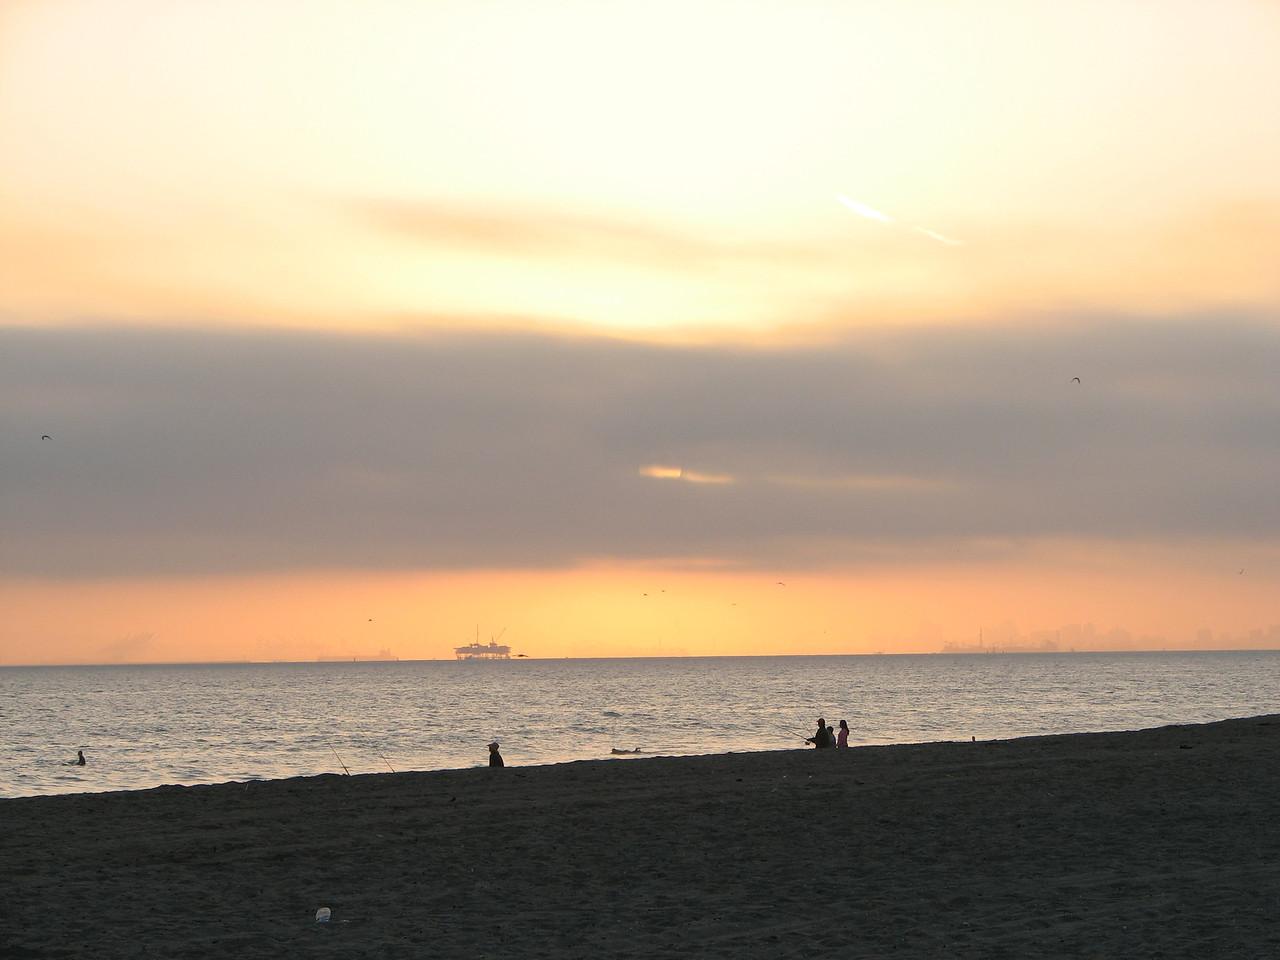 2007 06 22 Fri - Normal sunset